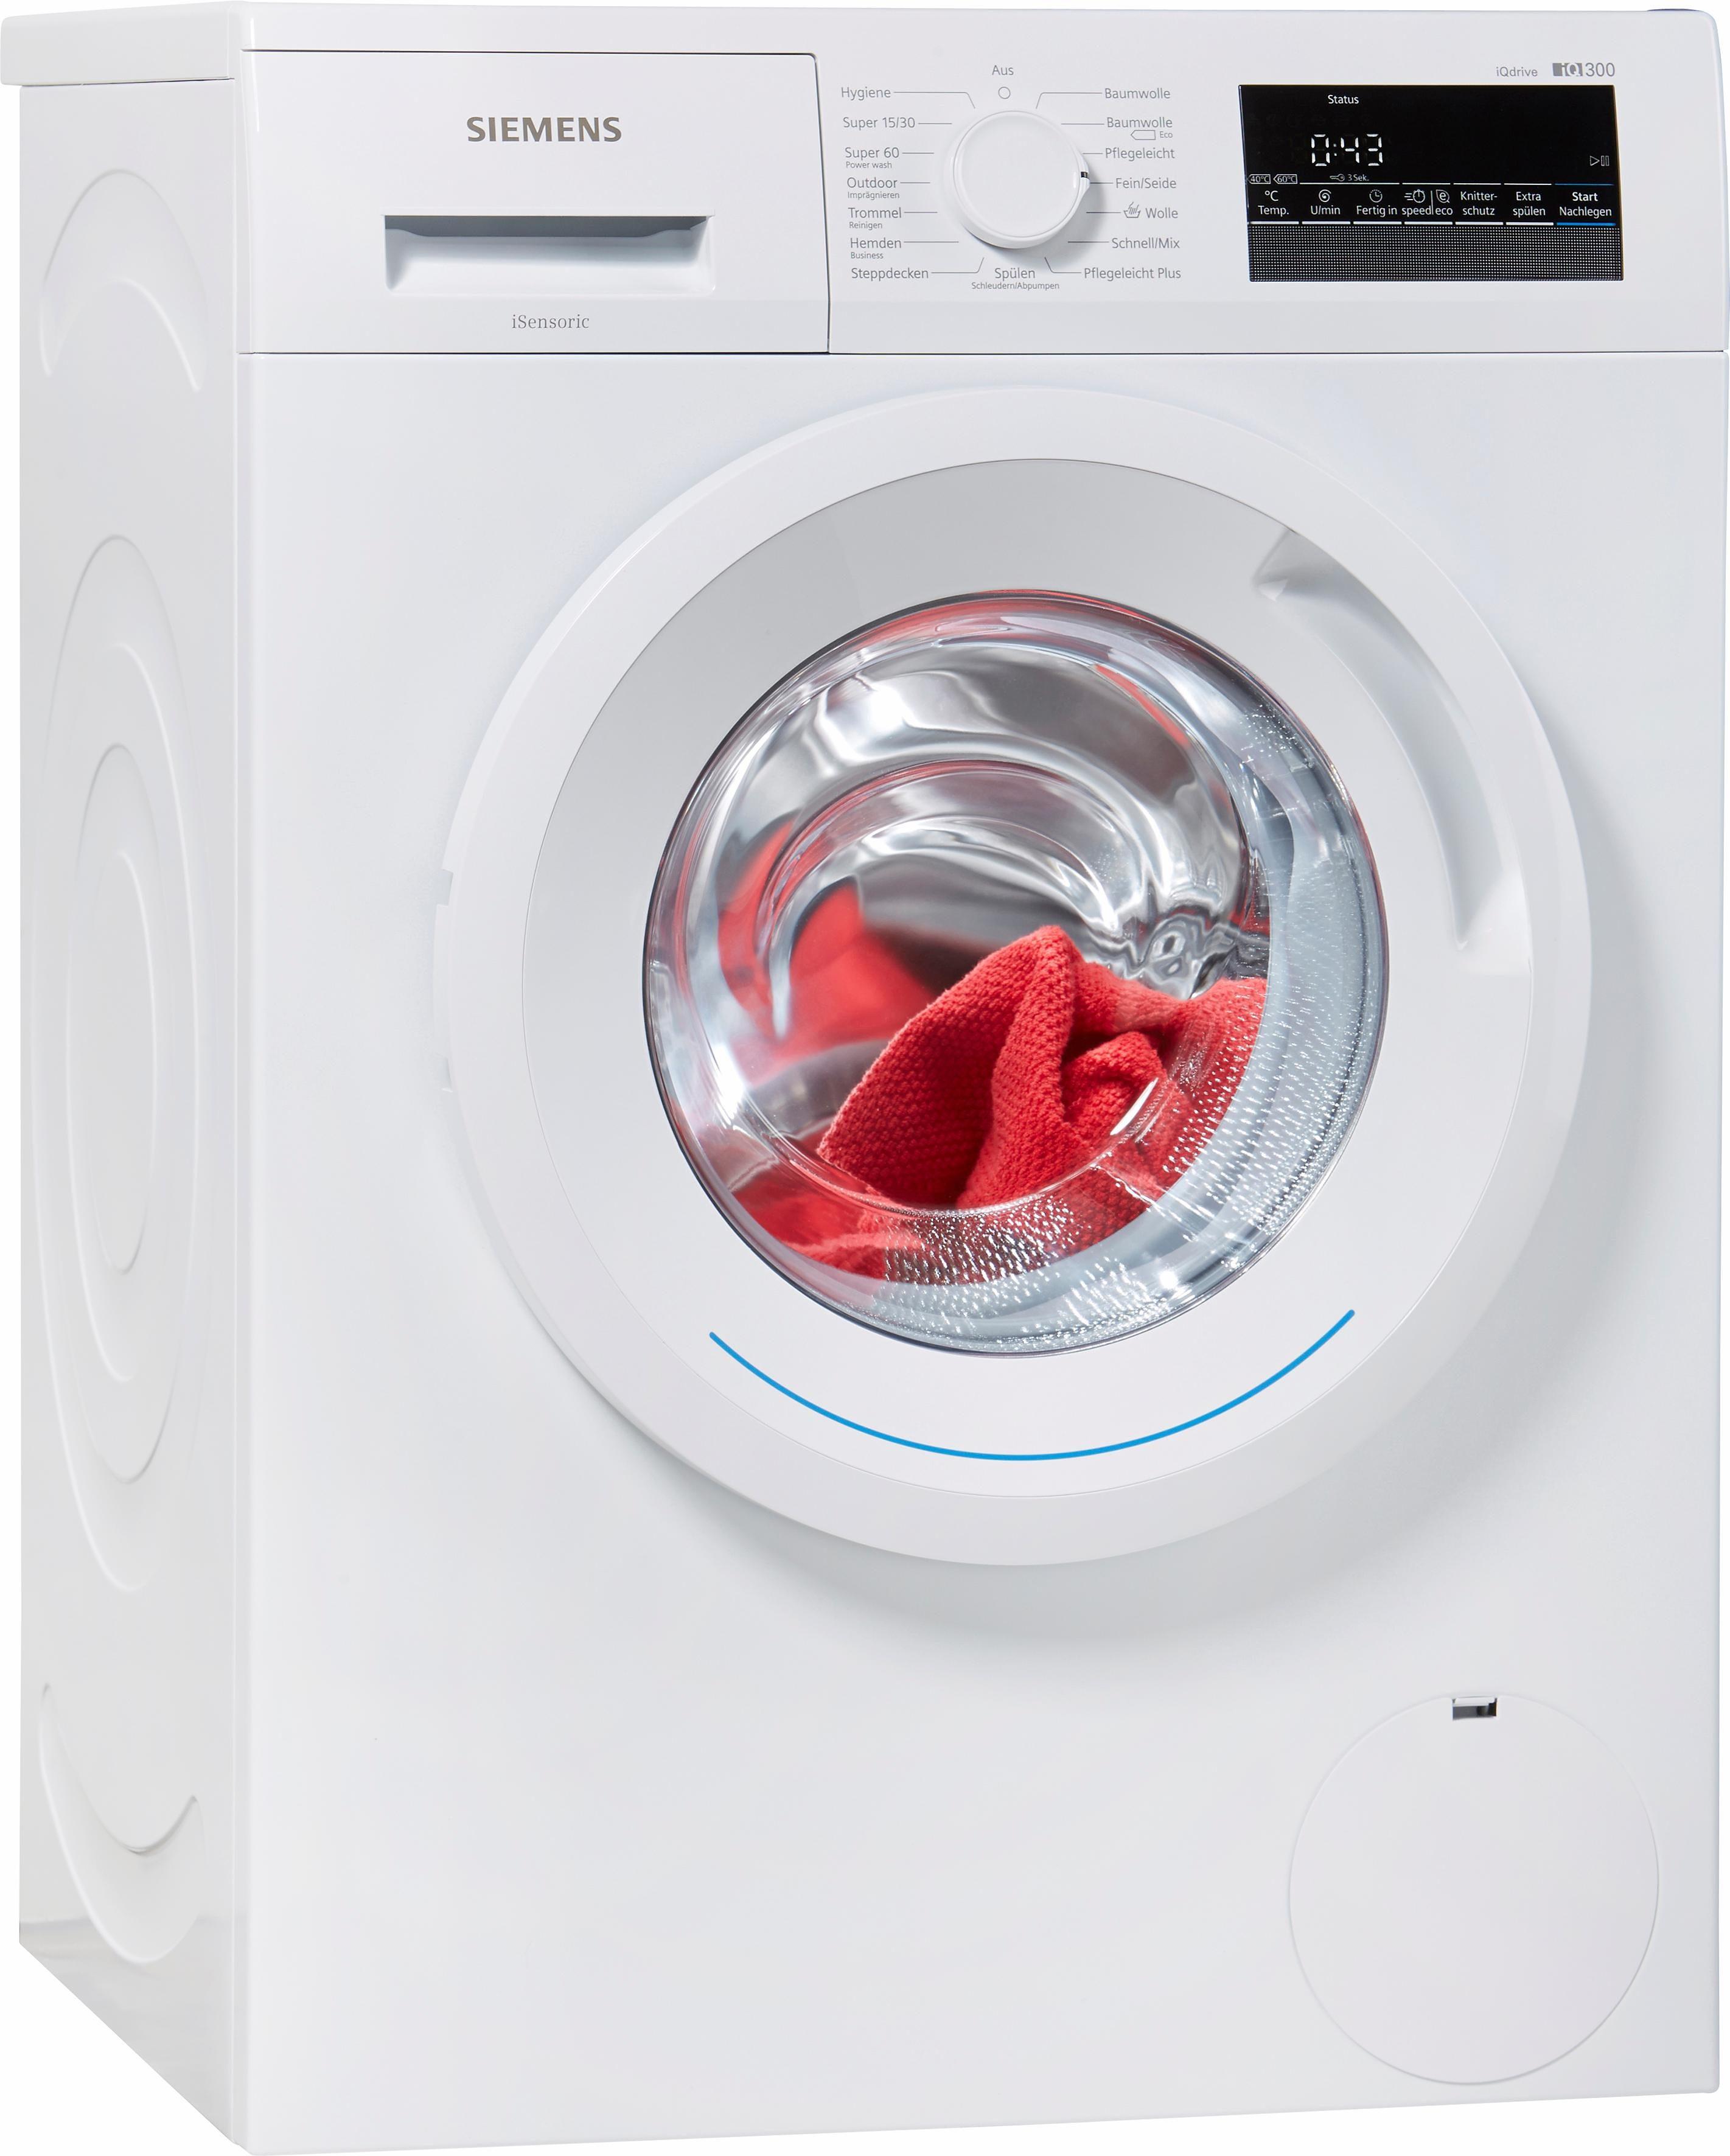 SIEMENS Waschmaschine iQ300 WM14N2ECO, A+++, 7 kg, 1400 U/Min